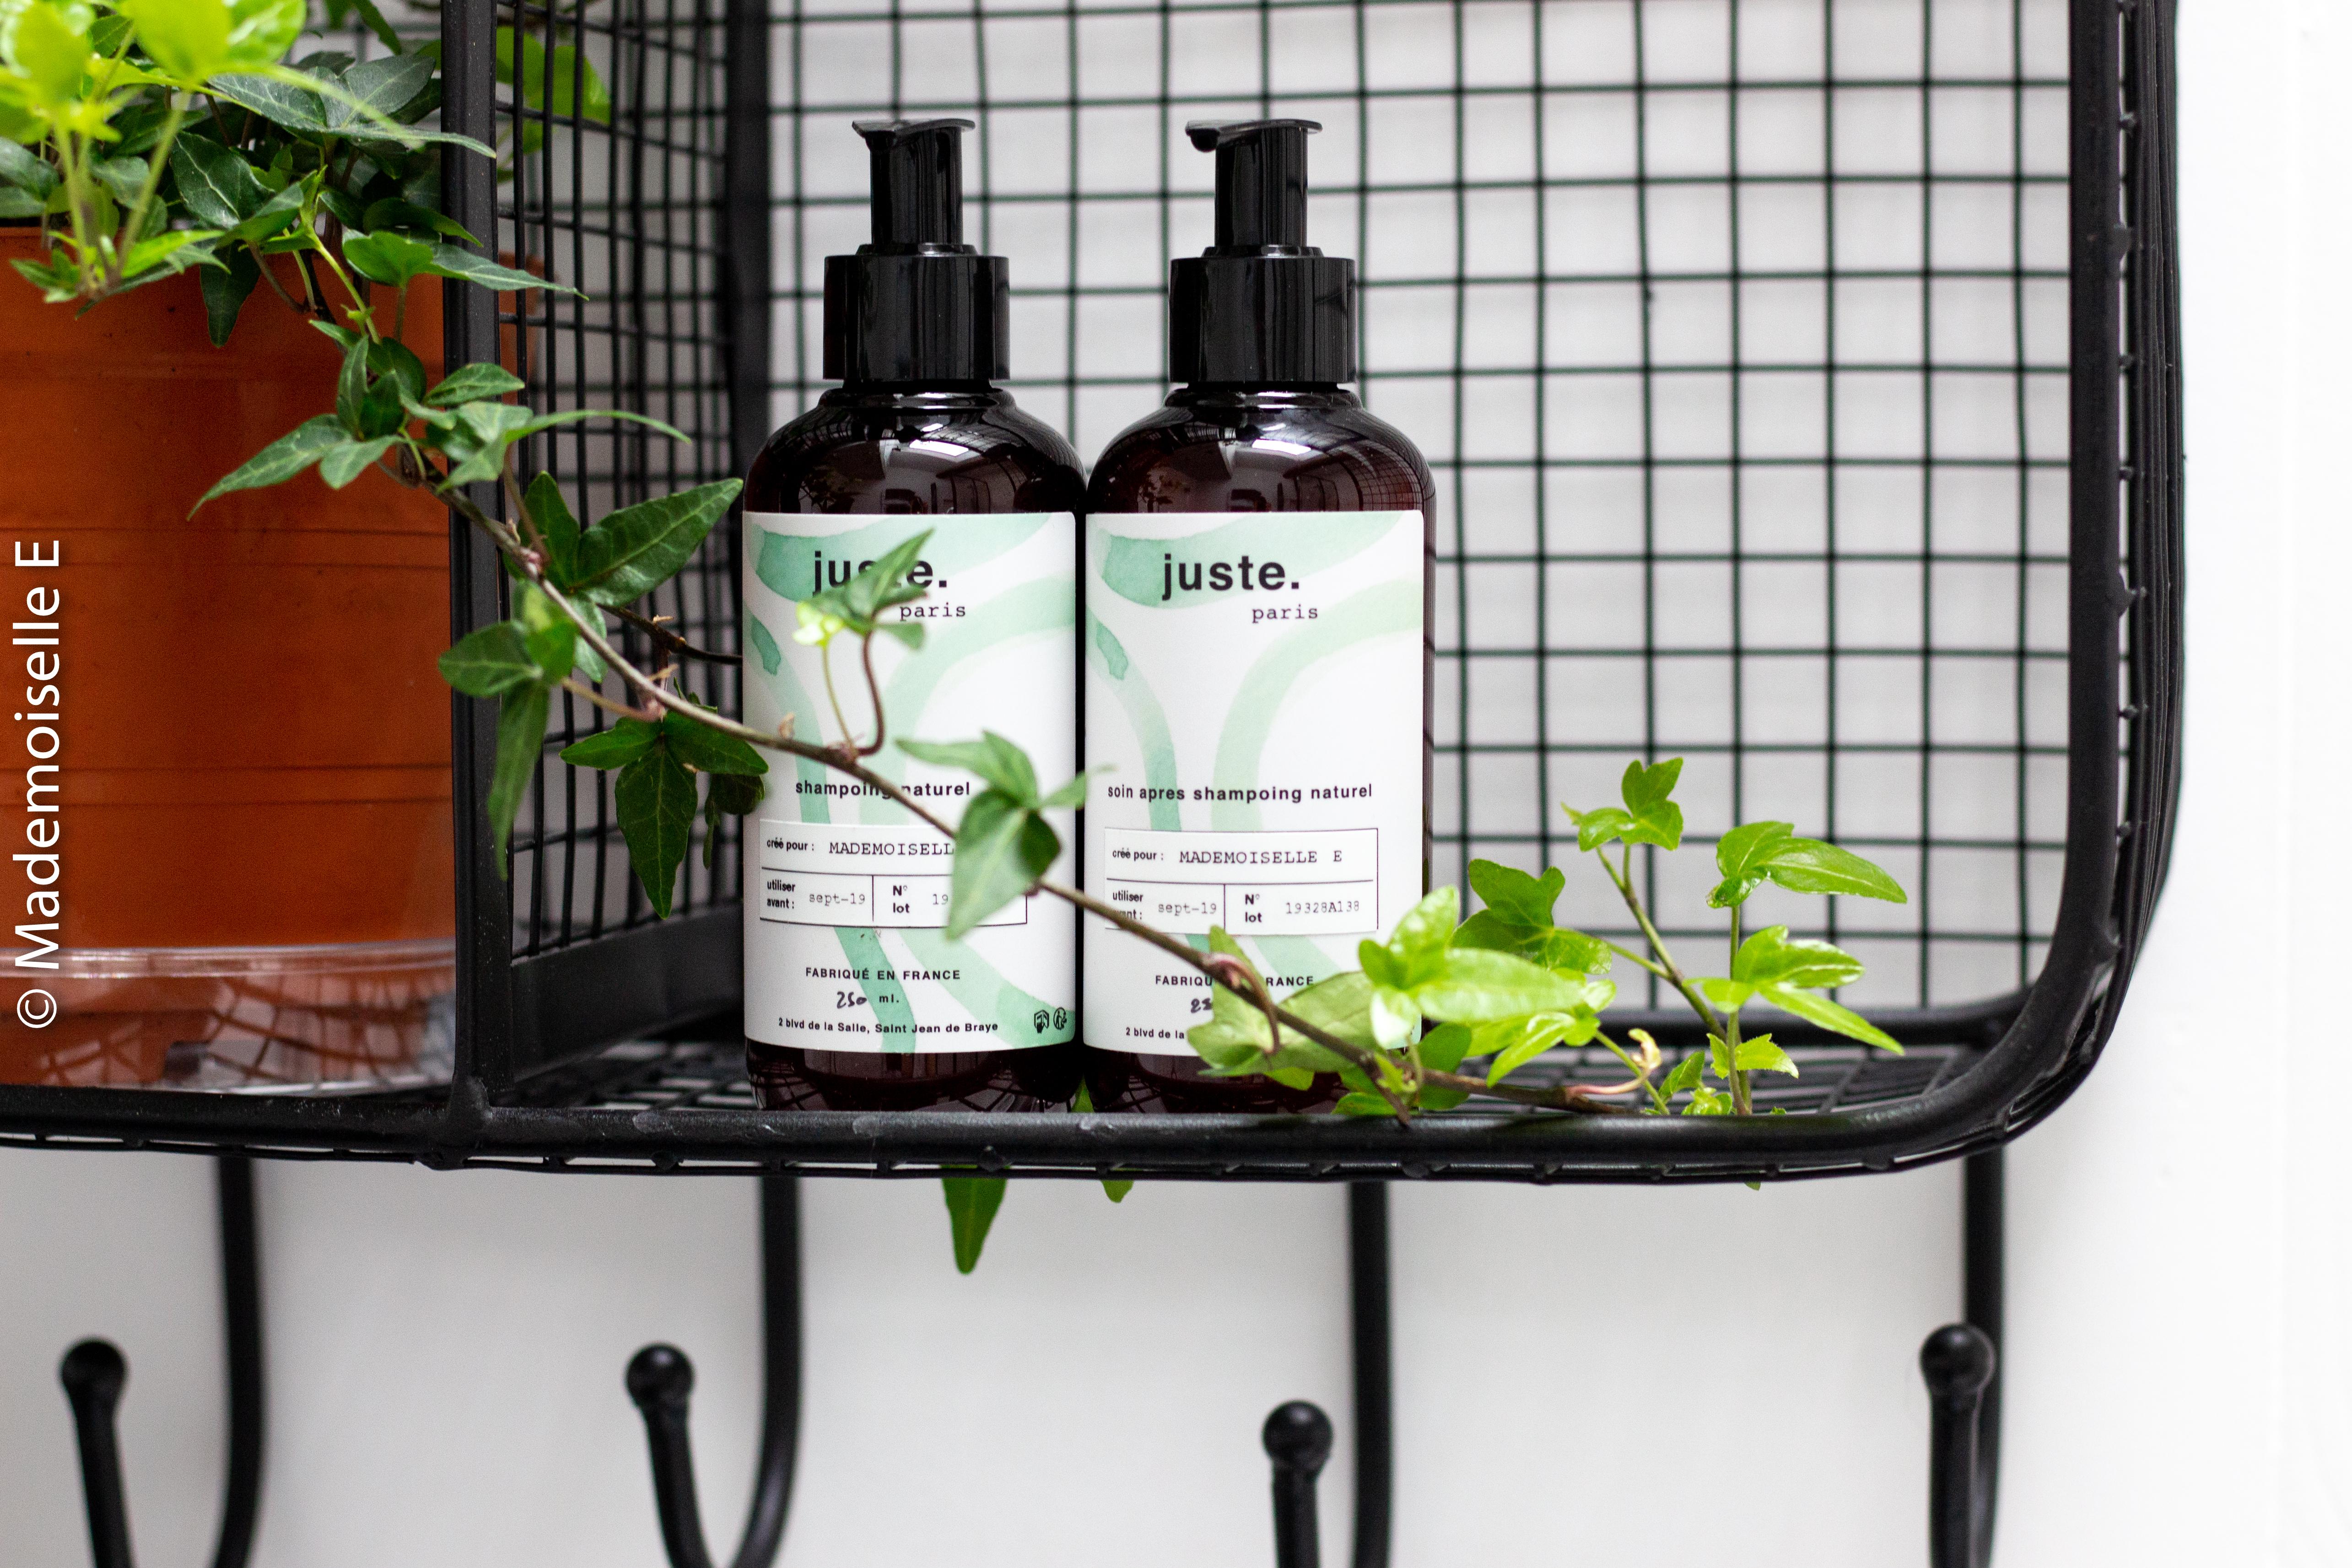 juste-le-shampoing-naturel-3-mademoiselle-e